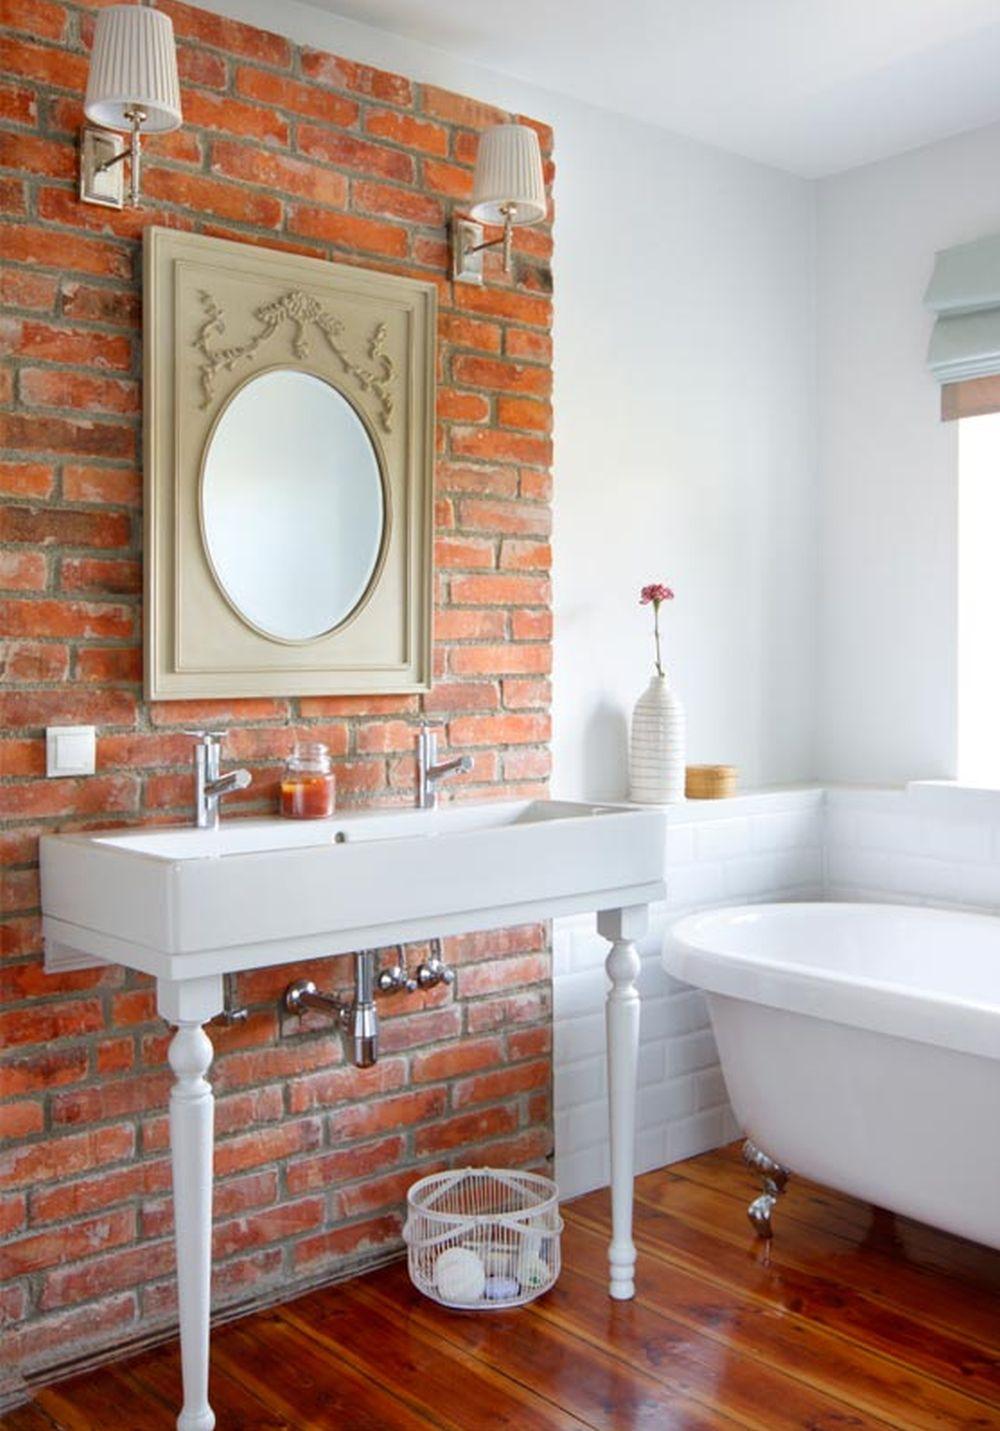 adelaparvu.com despre casa cu interior in stil englezesc, casa Polonia, design Marta Sikorska, Foto Michal Zalewski (7)